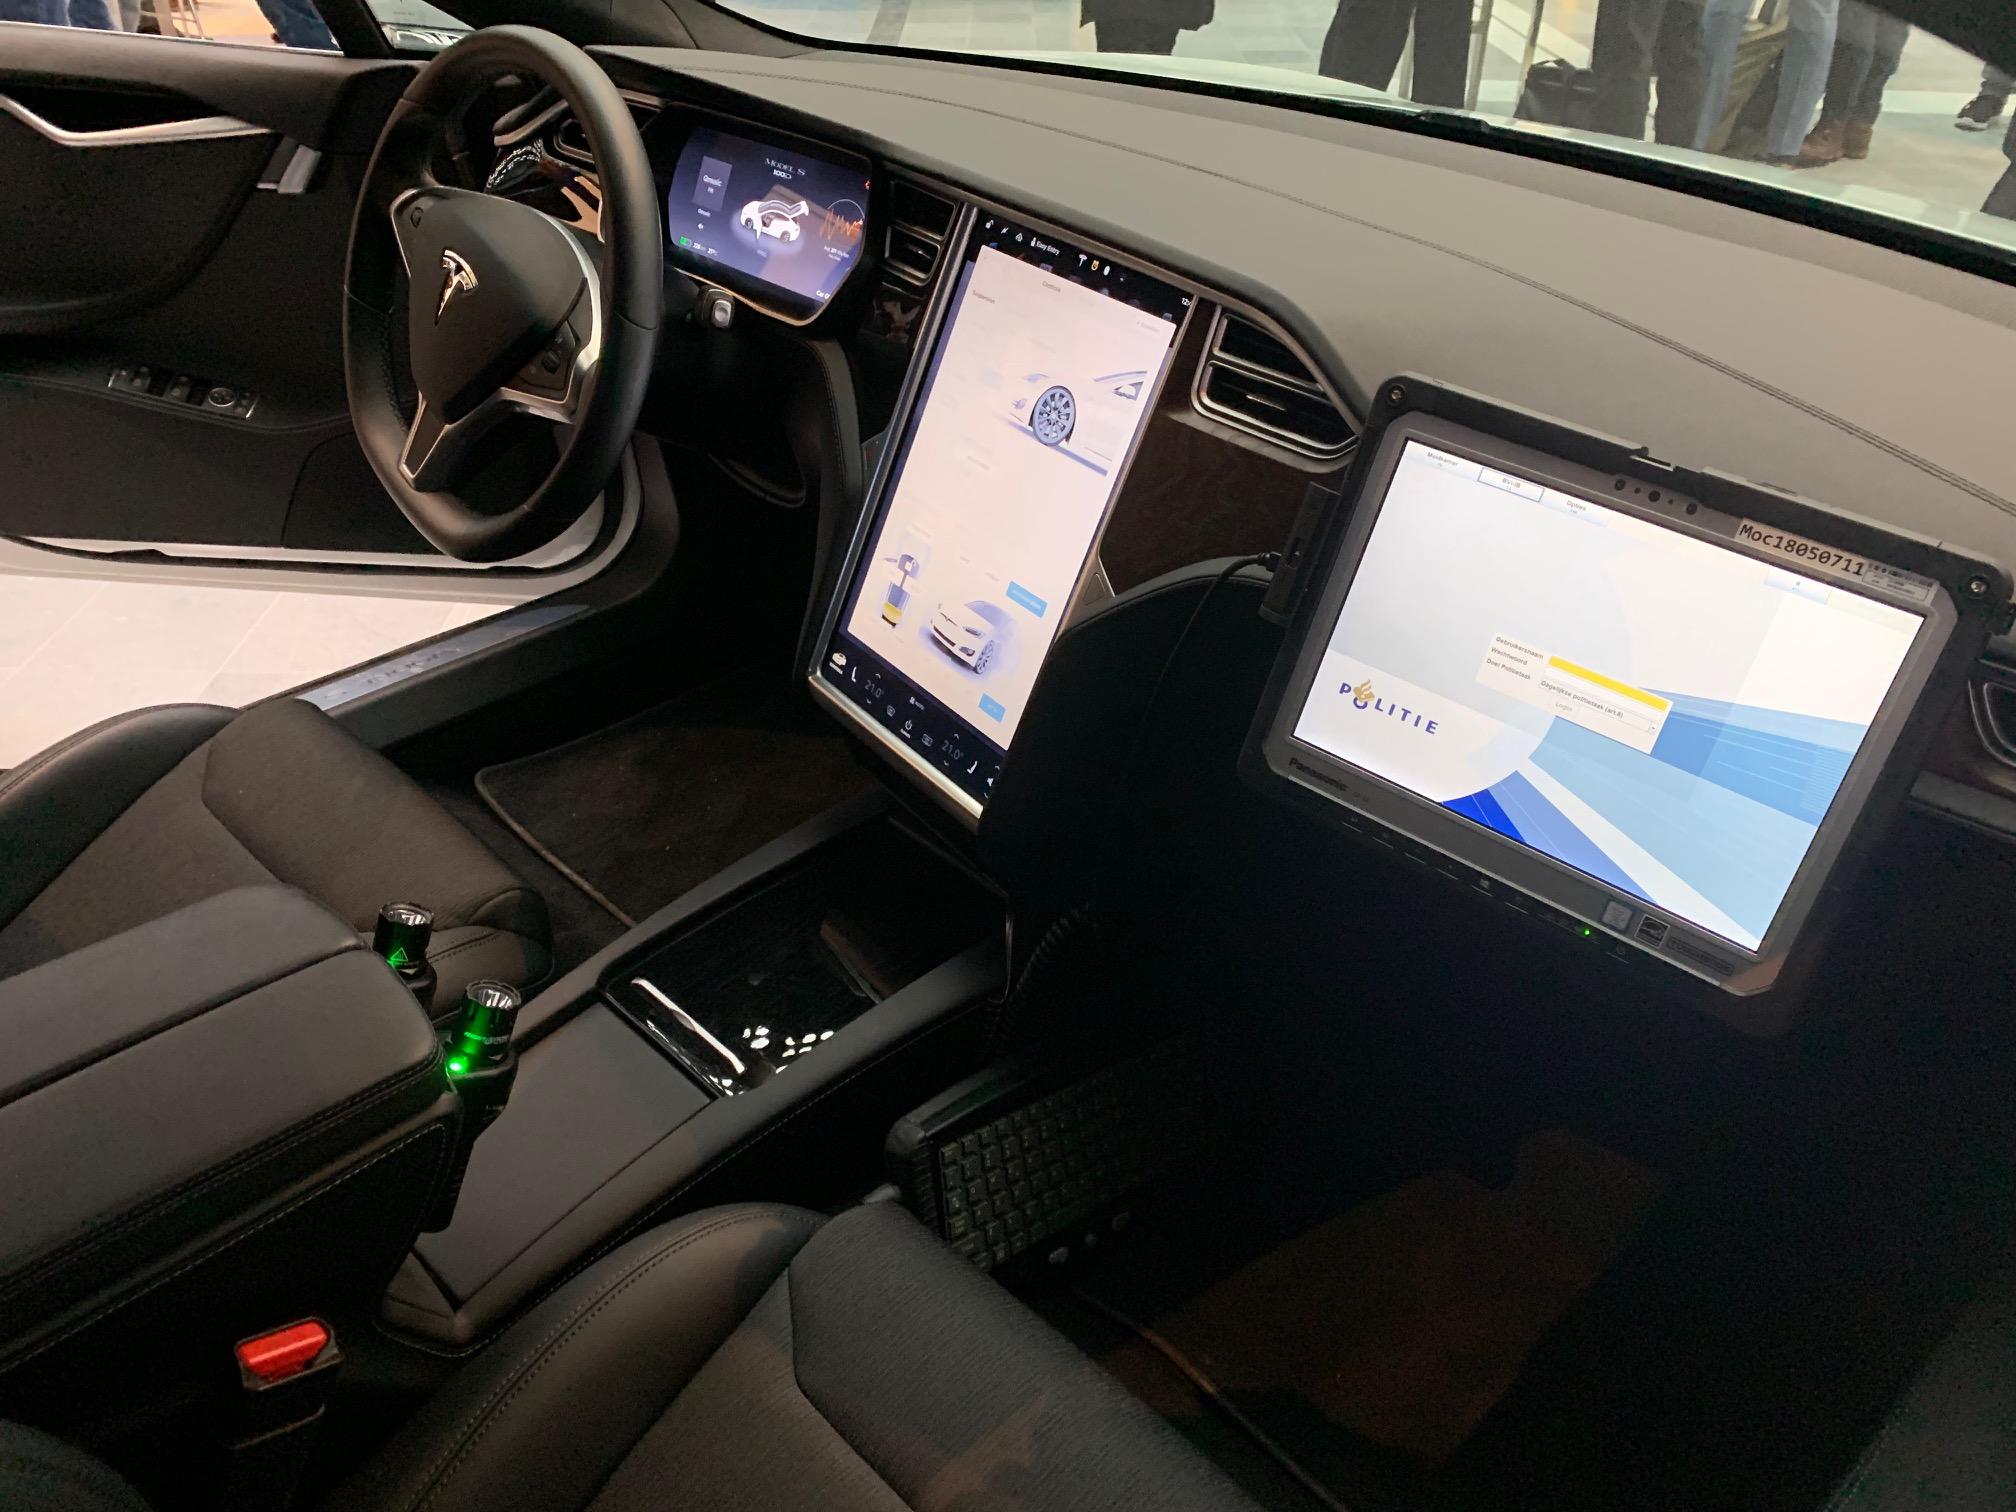 Tesla Model S becomes sneaky undercover police car - Electrek